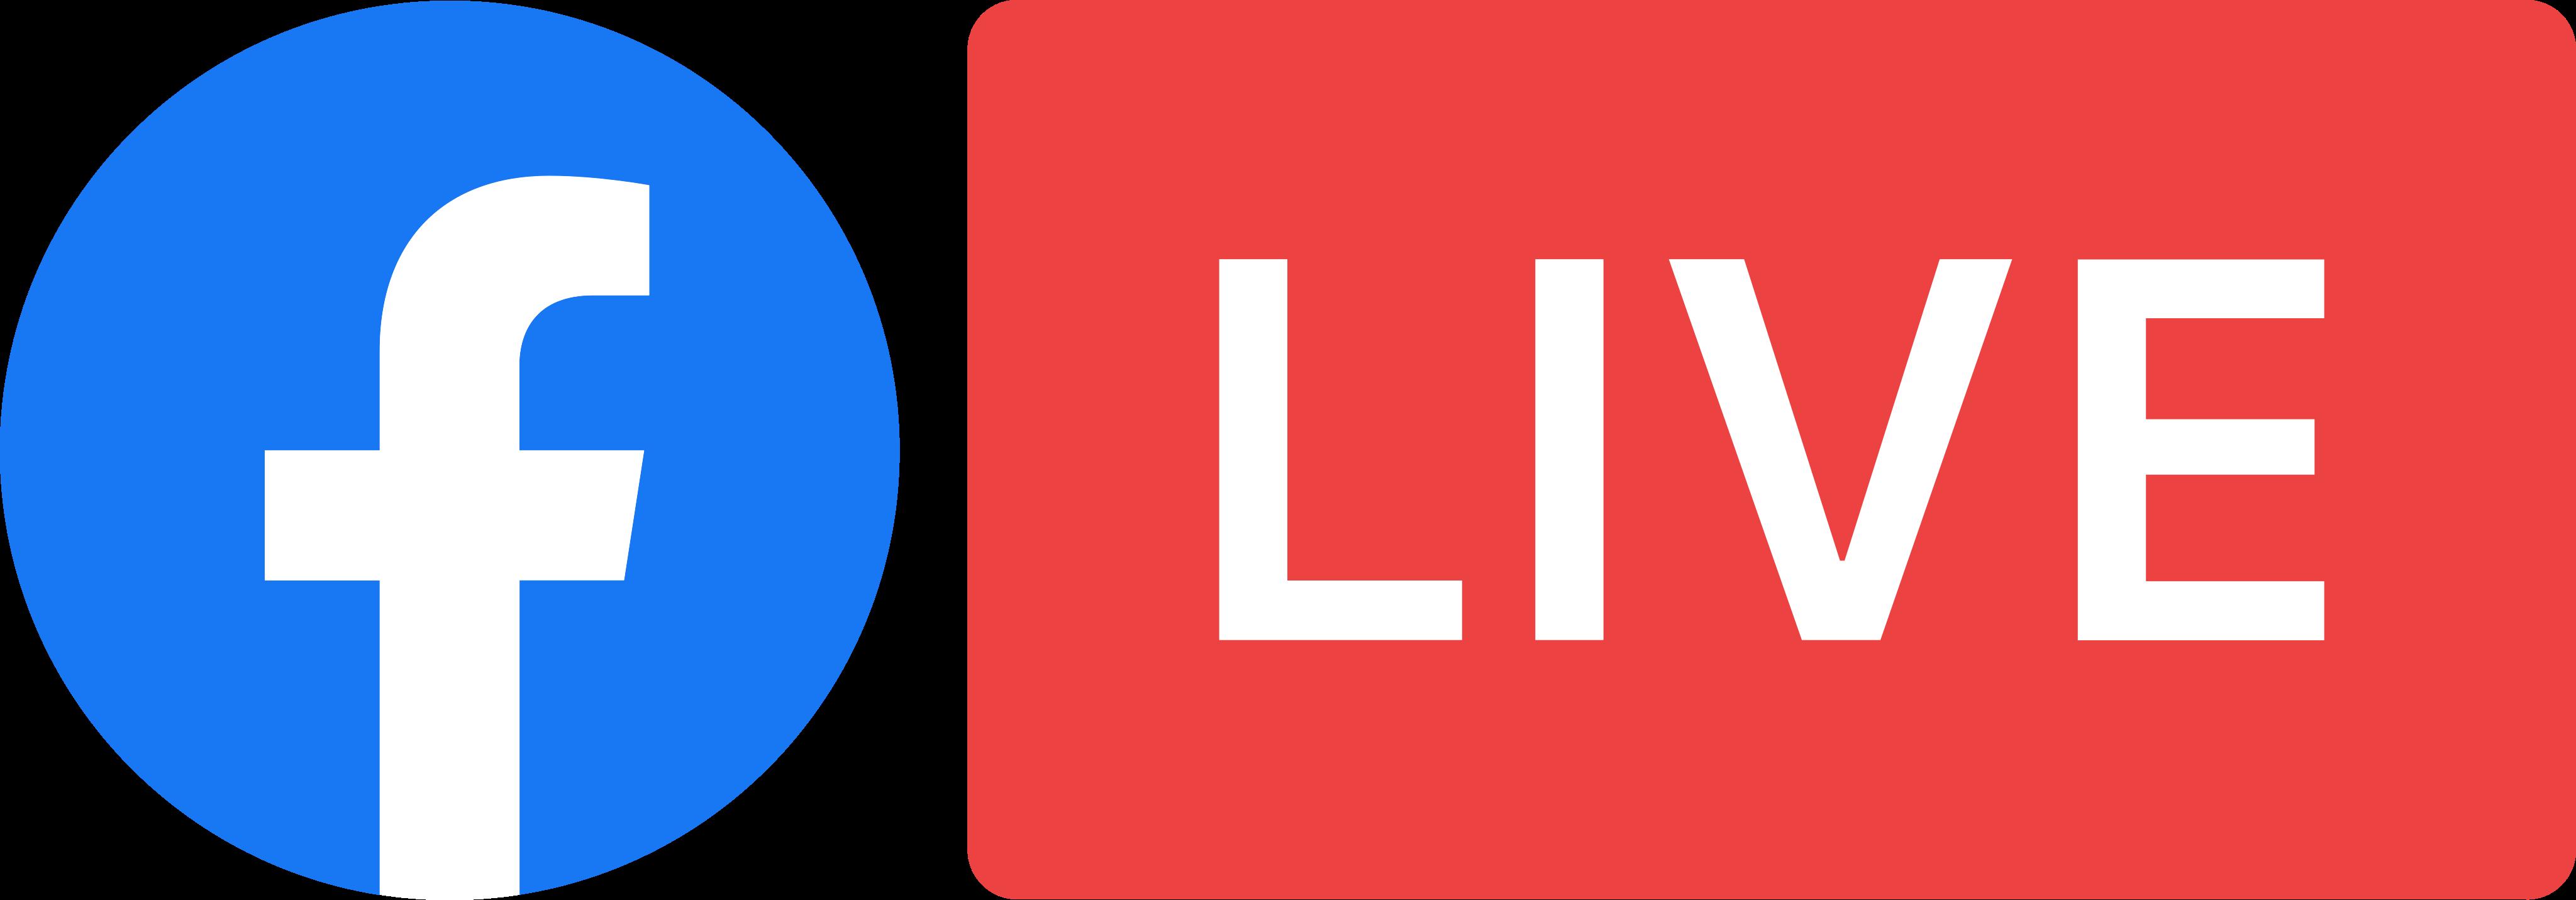 facebook live logo - Facebook Live Logo